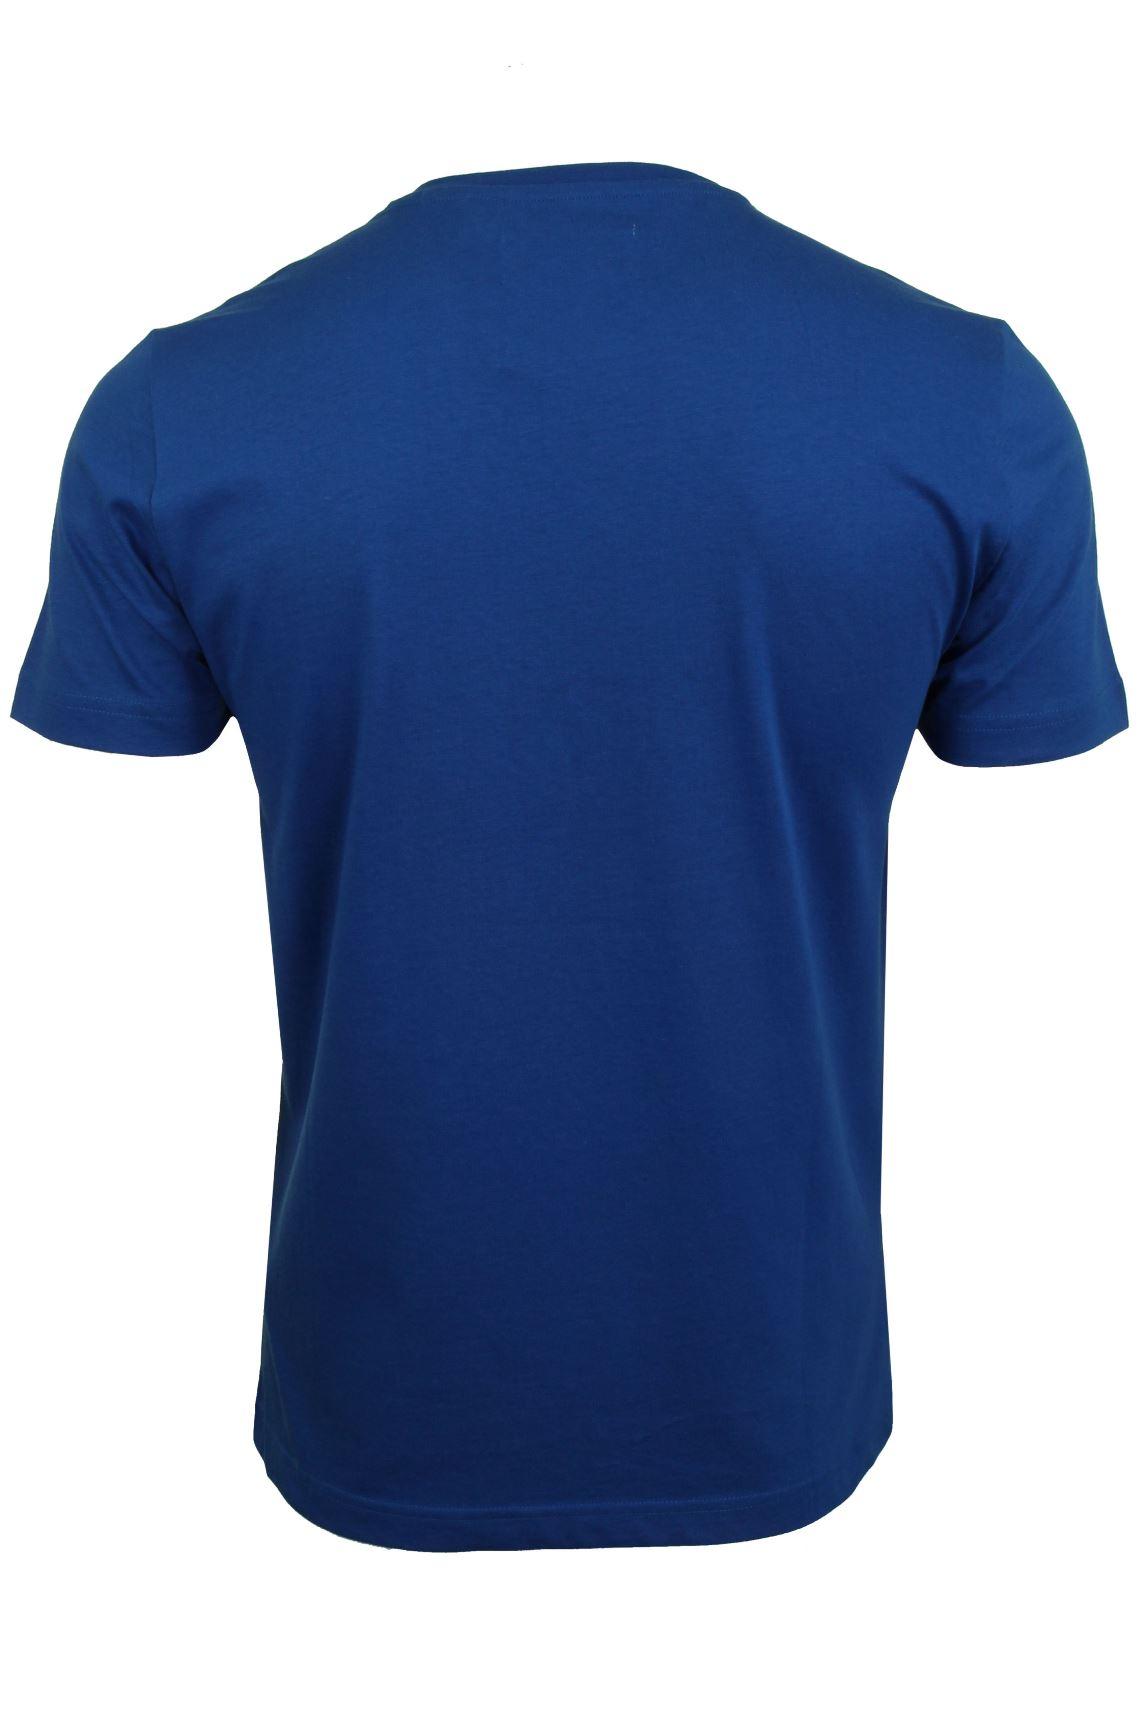 Mens-T-Shirt-by-Original-Penguin-Crew-Neck-Short-Sleeved thumbnail 47